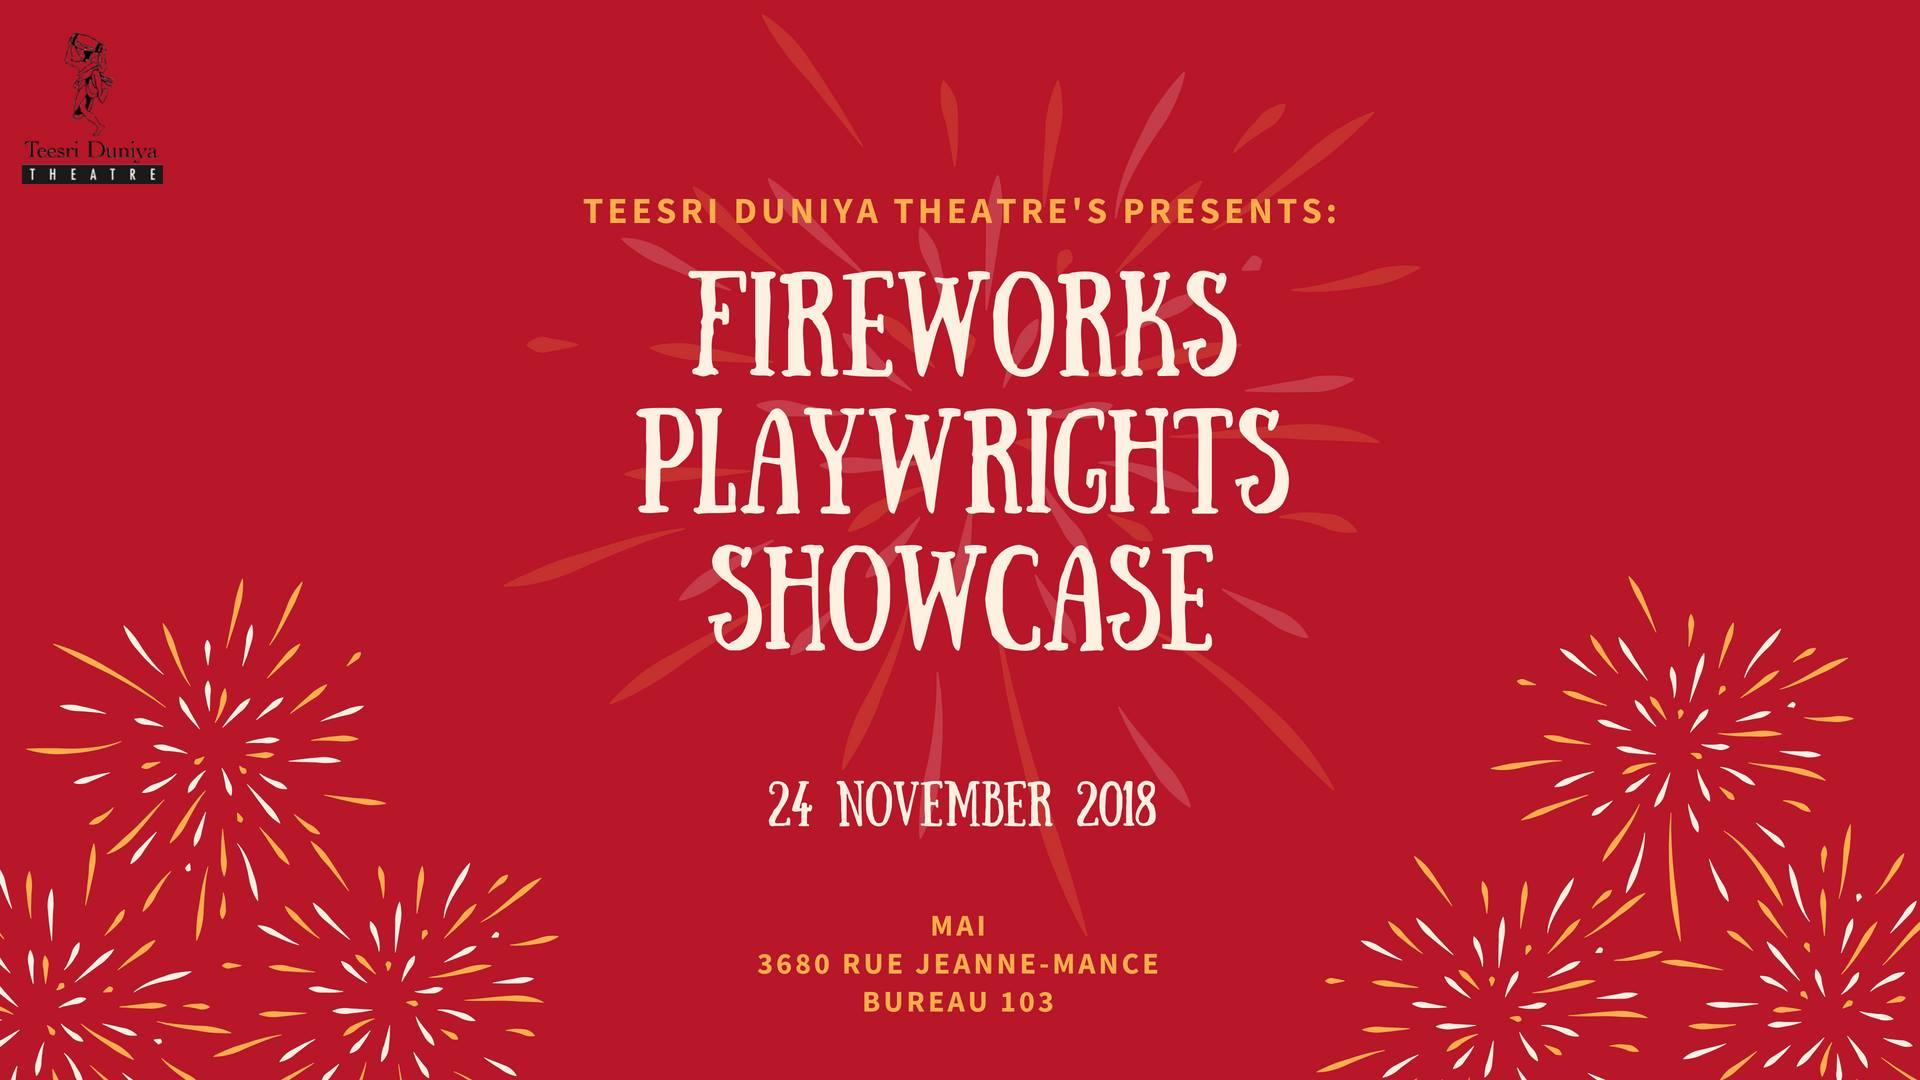 Fireworks Showcase - 2018